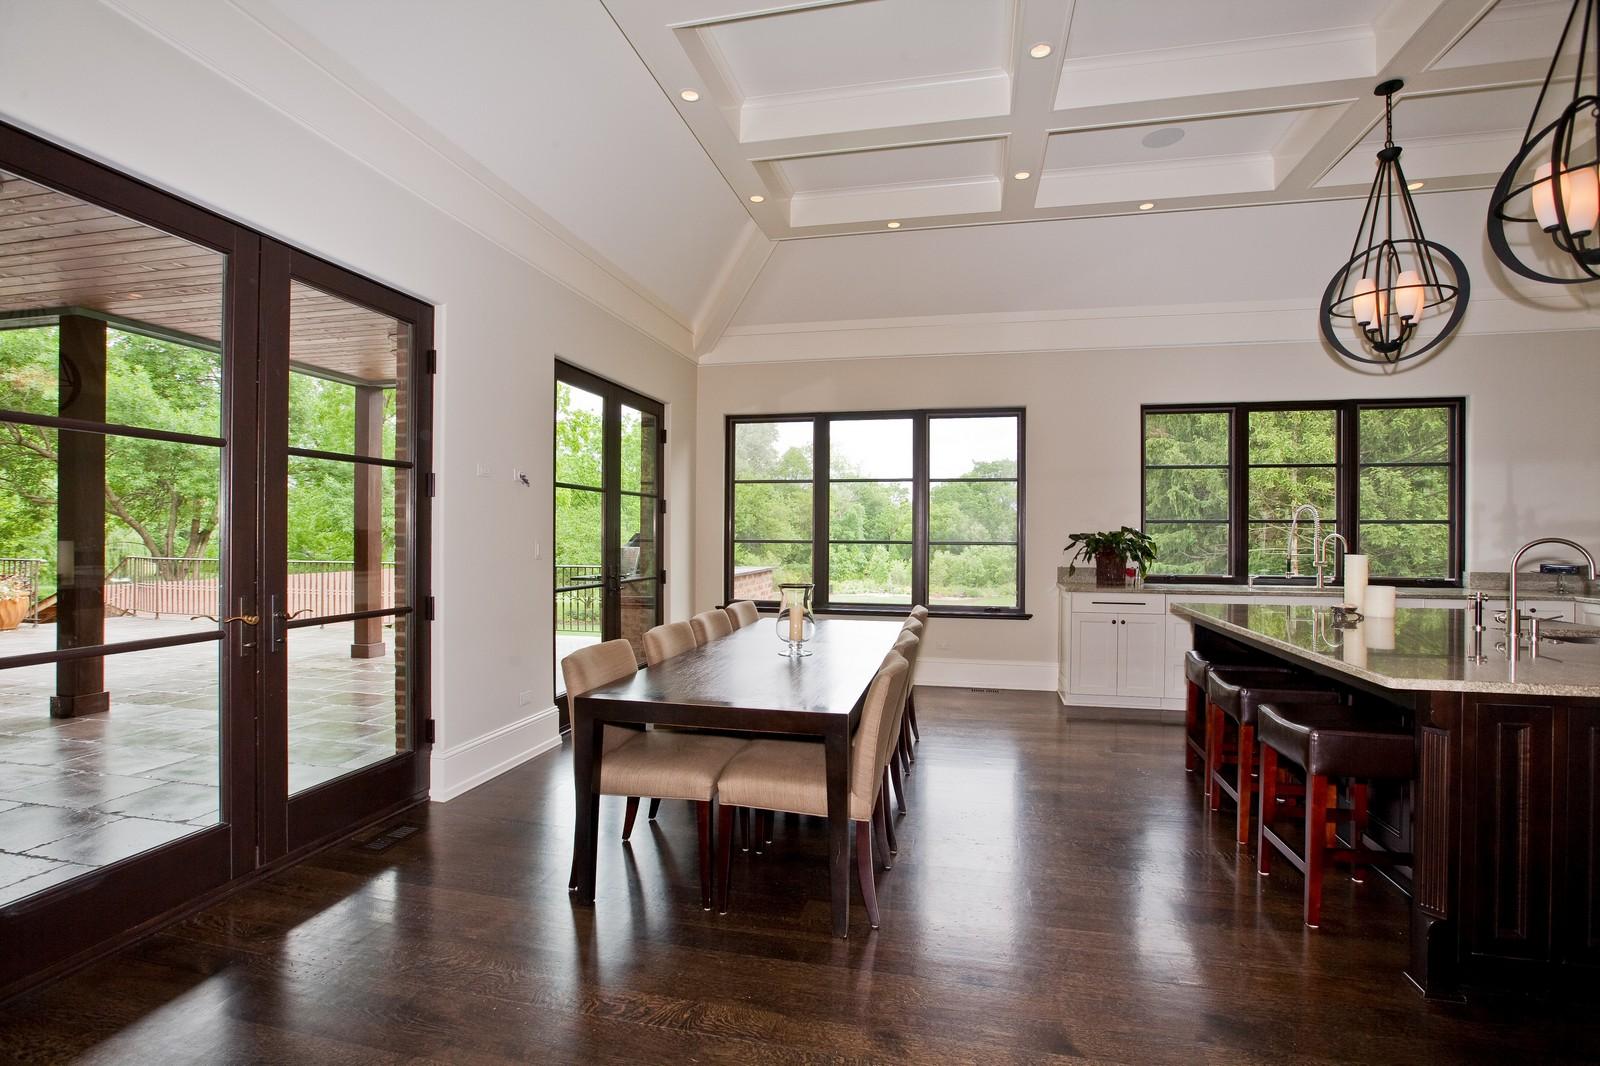 Real Estate Photography - 6143 Madison, Burr Ridge, IL, 60527 - Kitchen / Breakfast Room